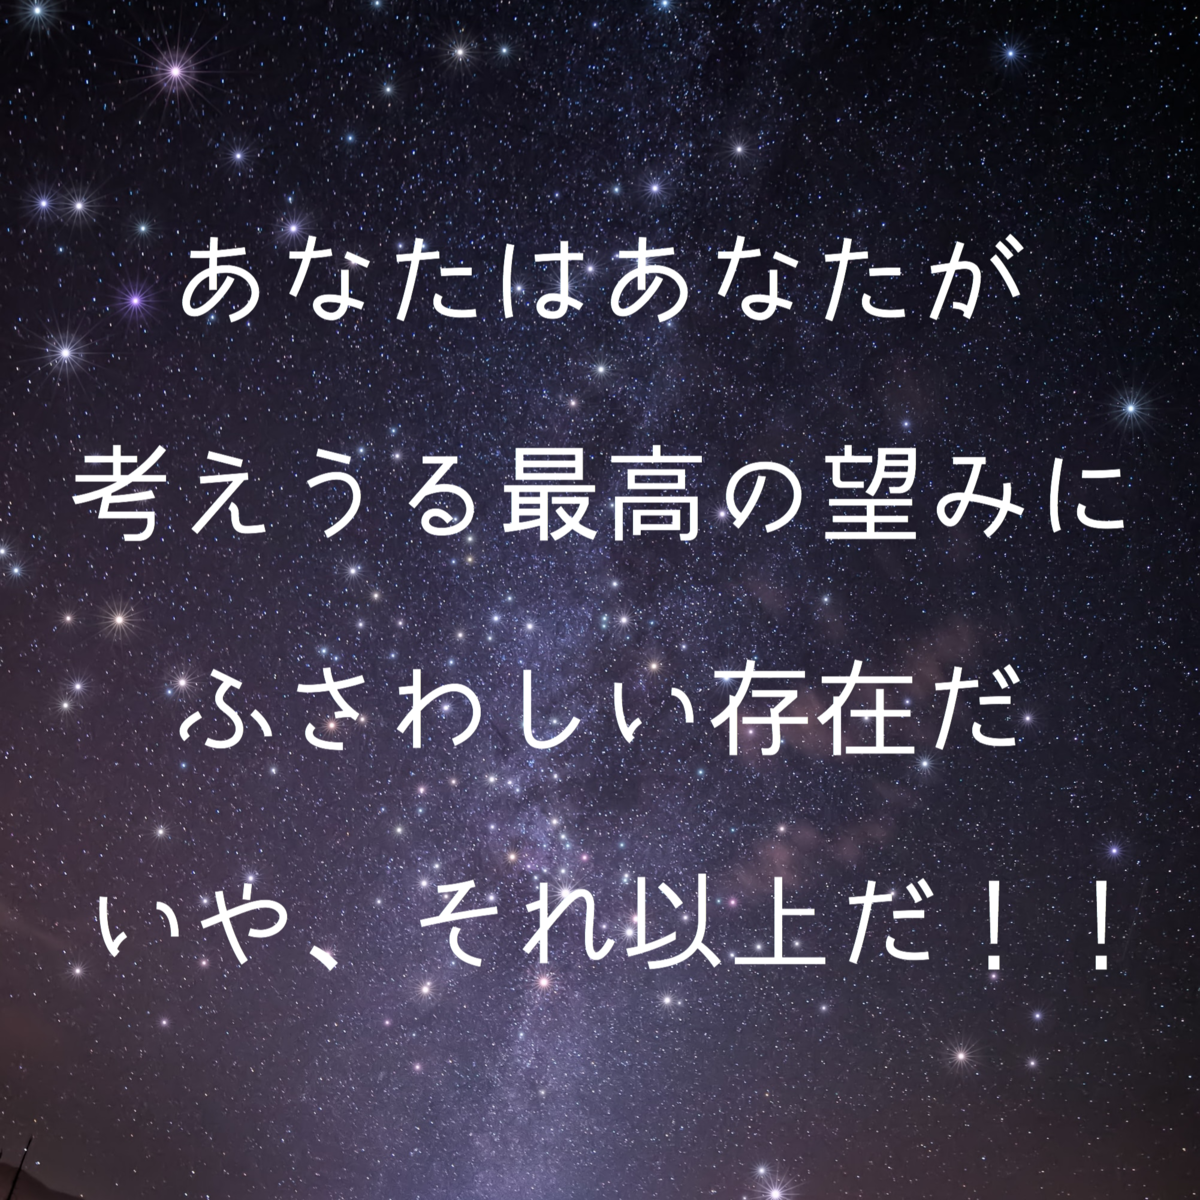 f:id:tatsunori-matsuda:20200629210708p:plain